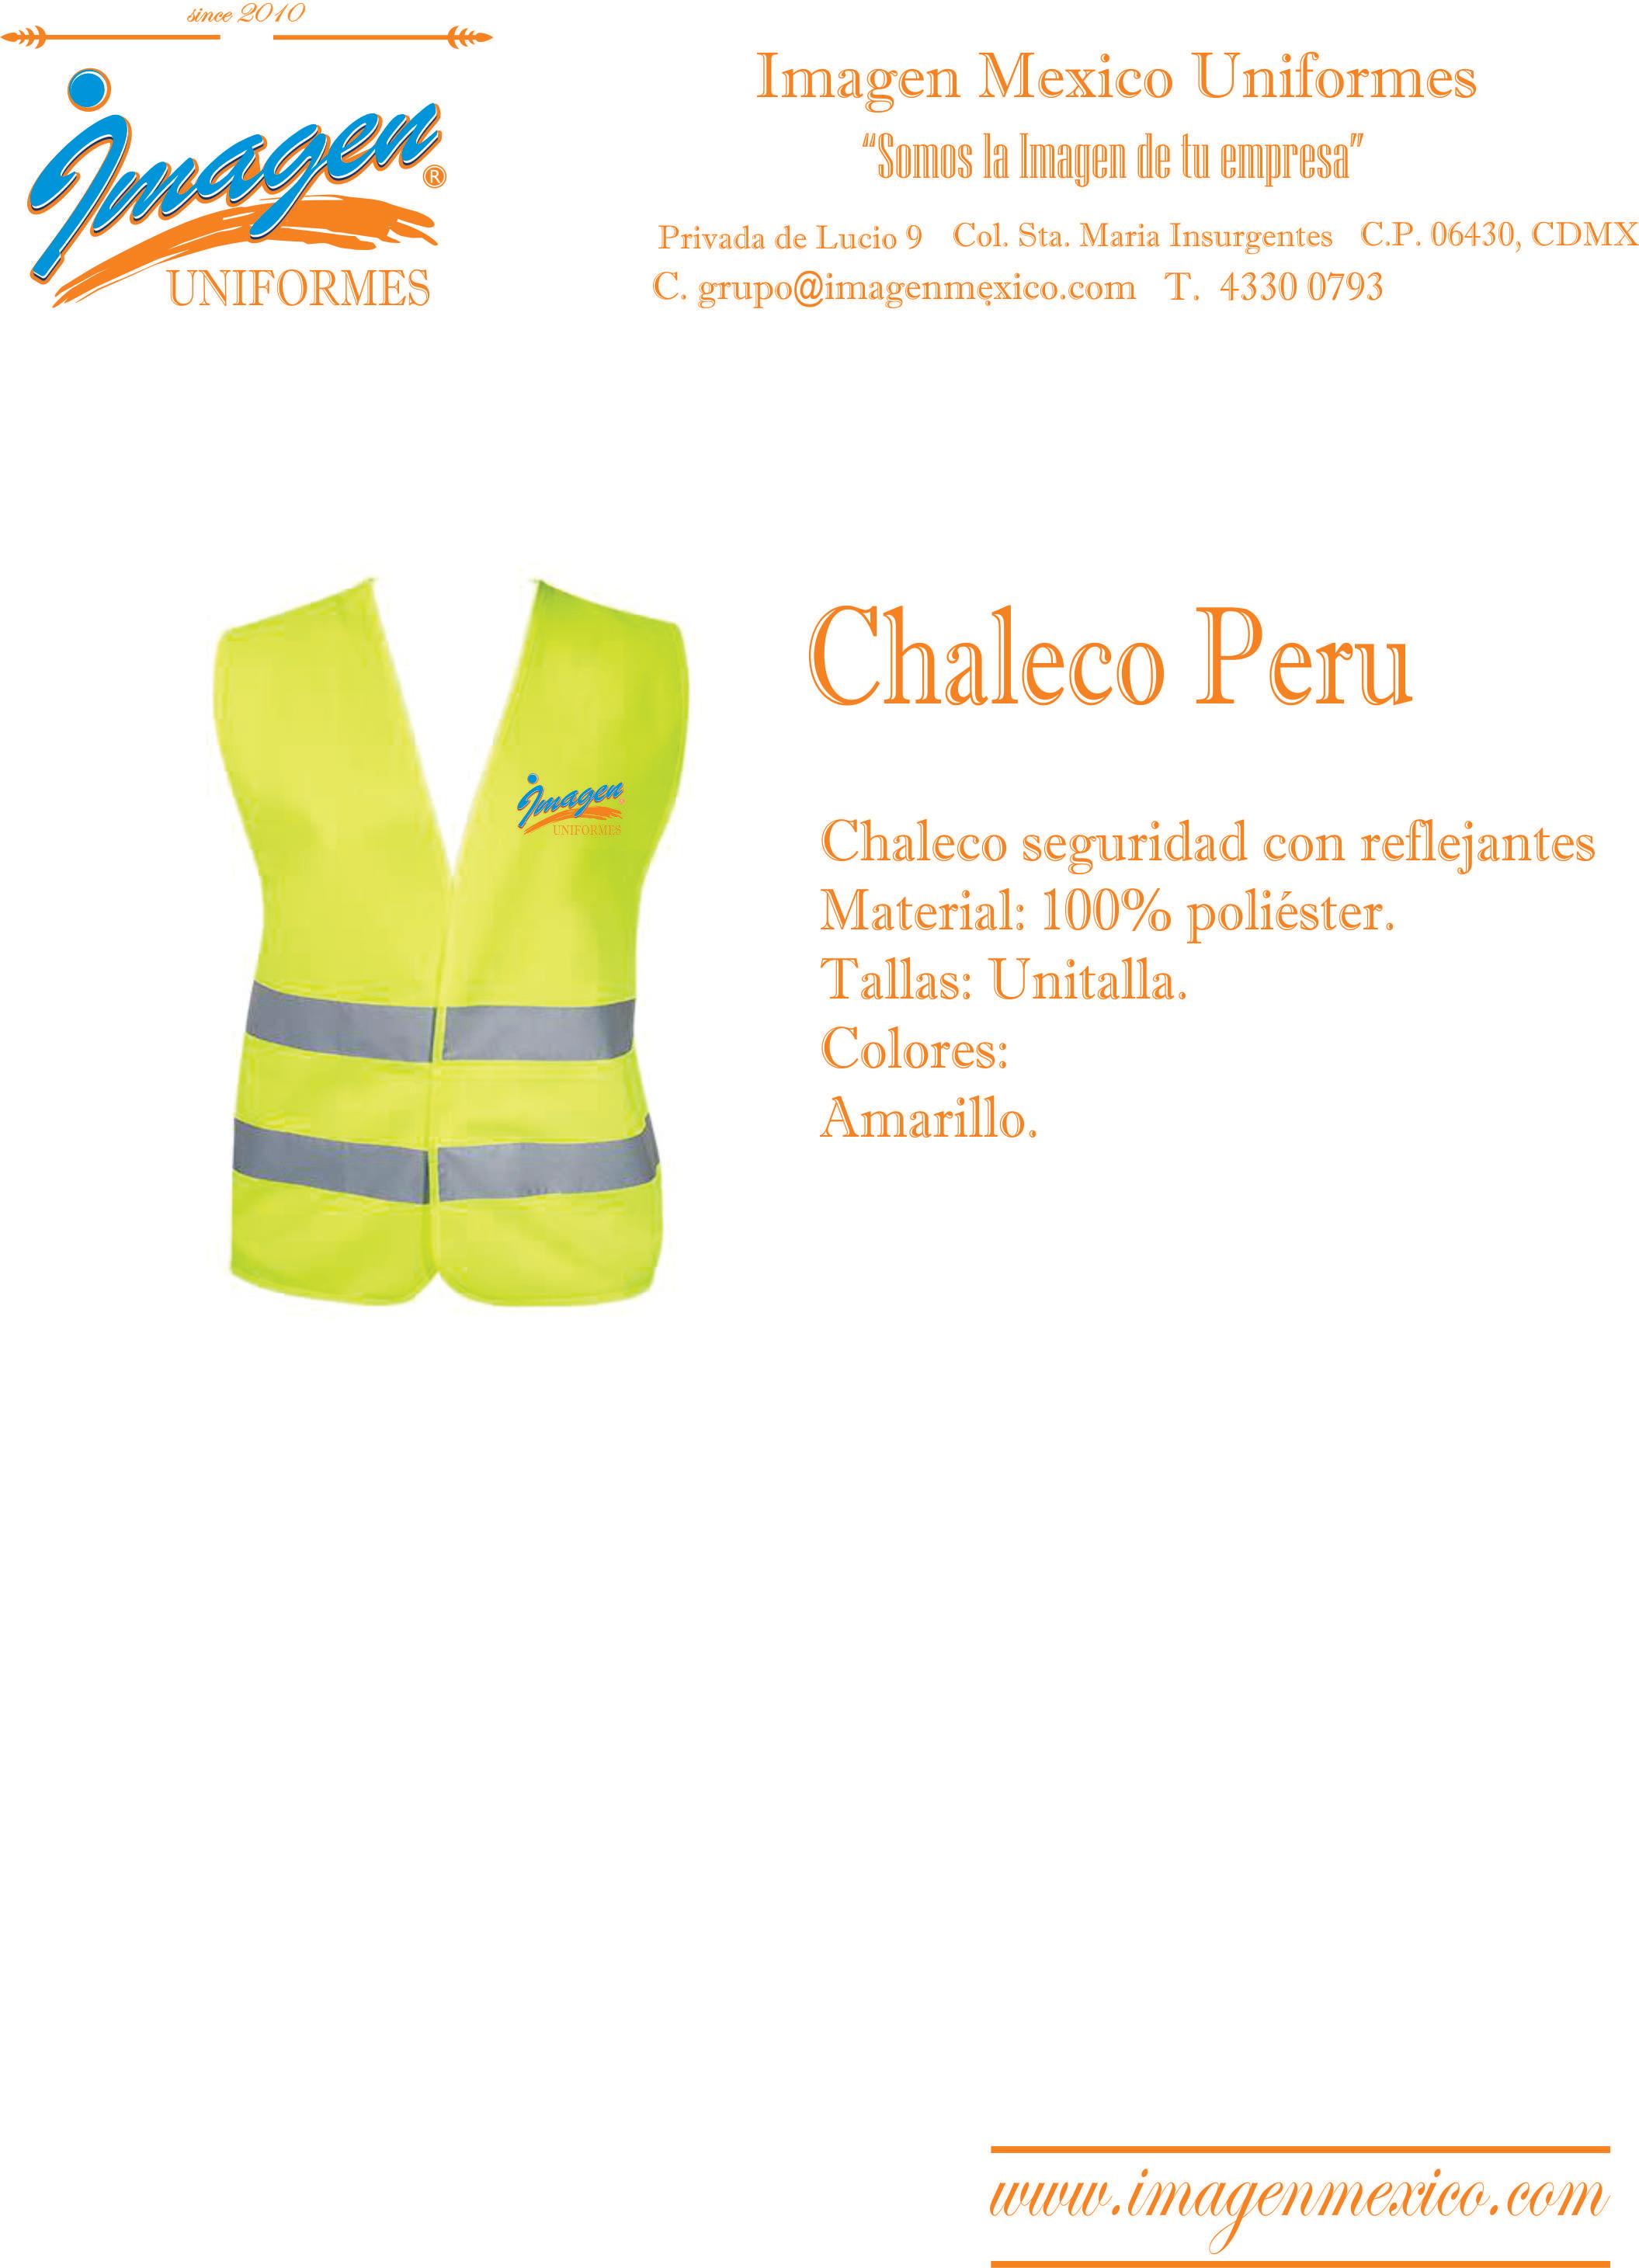 chalecos Peru 3 seguridad